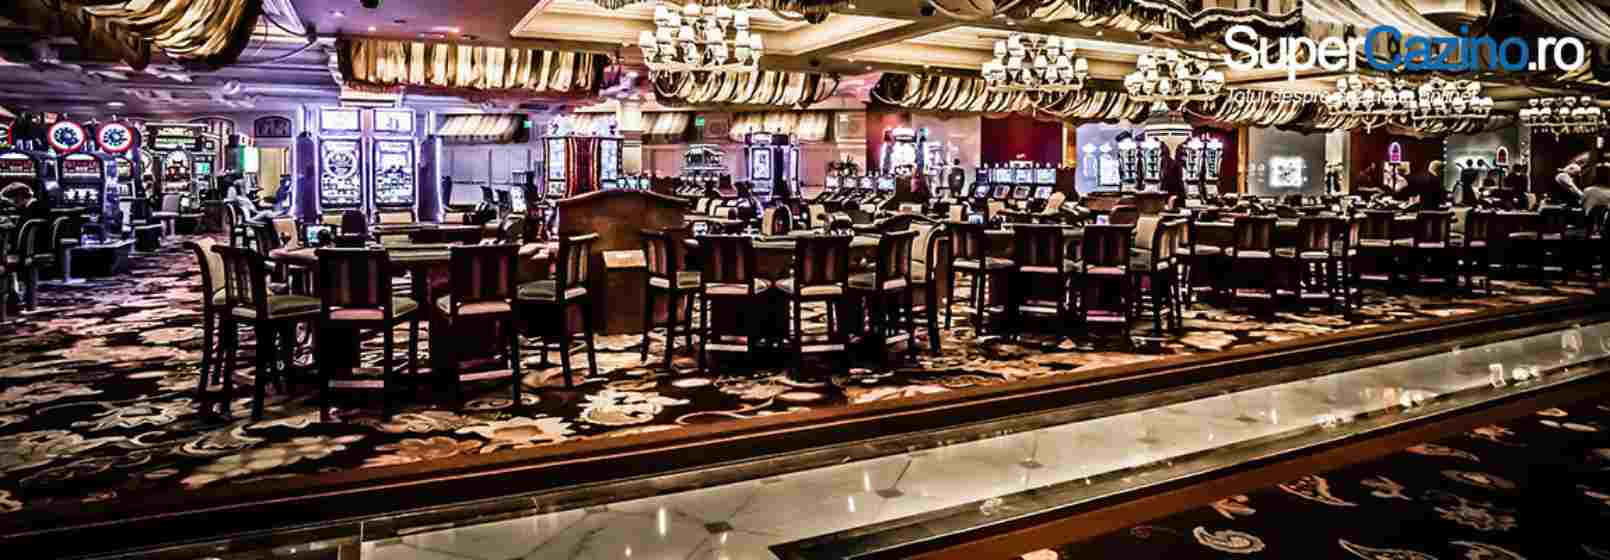 evolutie casino filipine